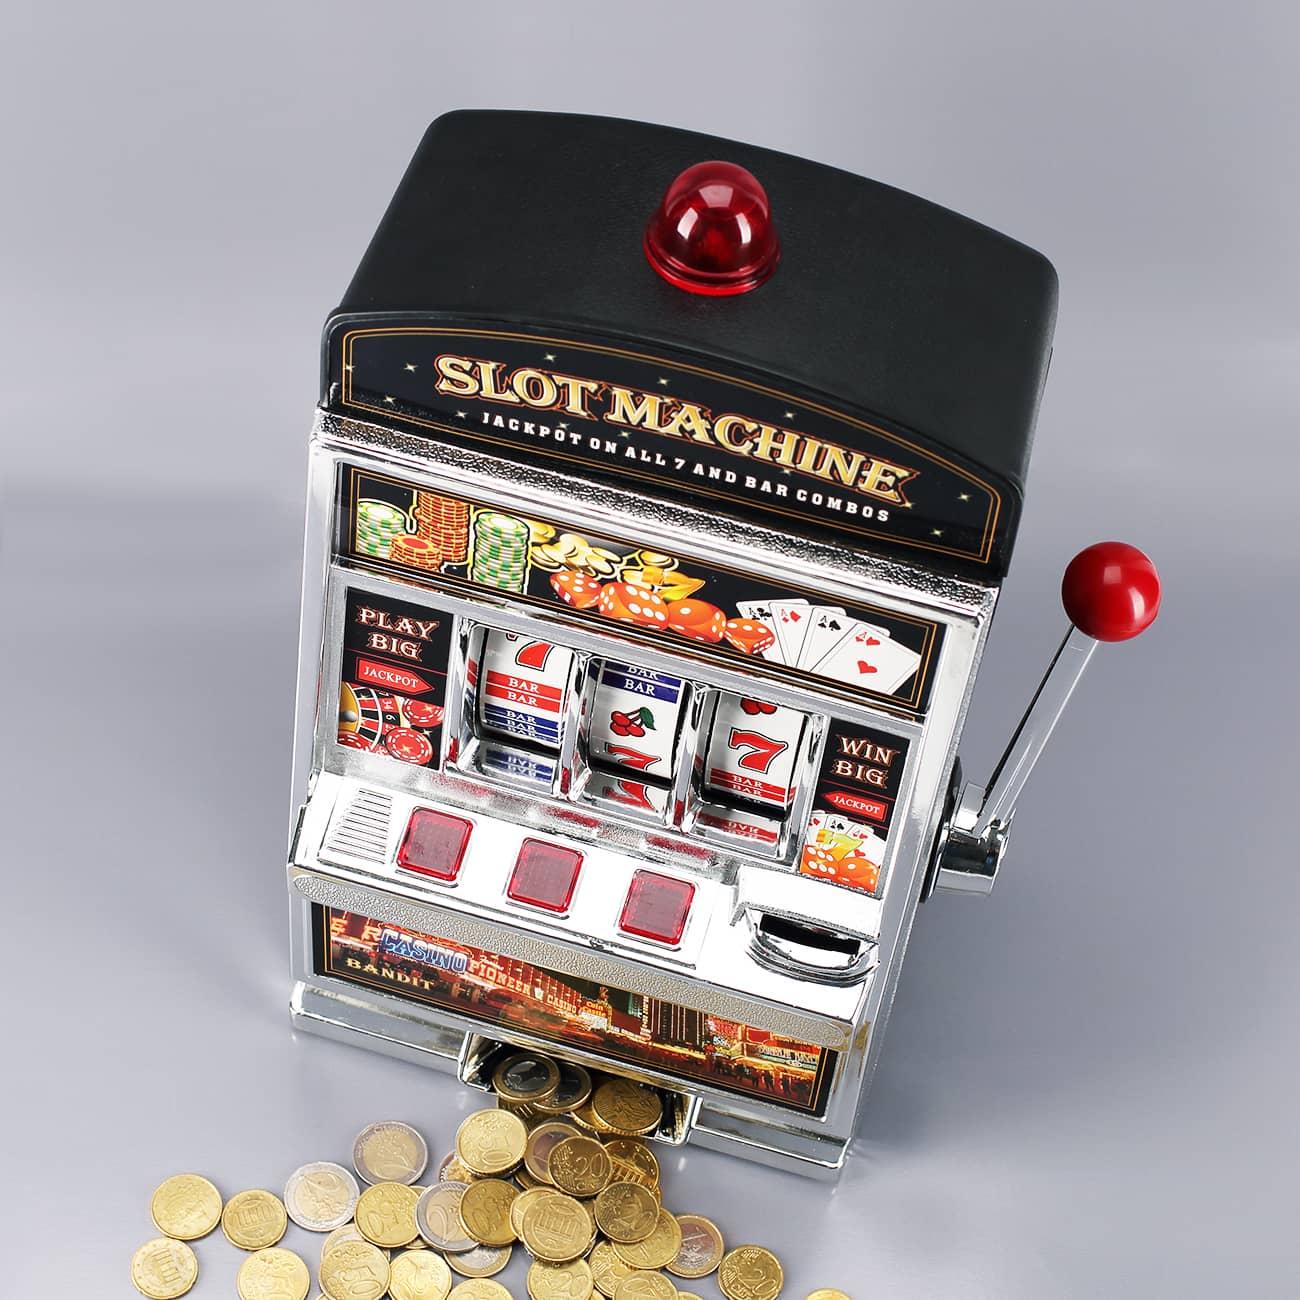 Slot Machine Fur Zuhause